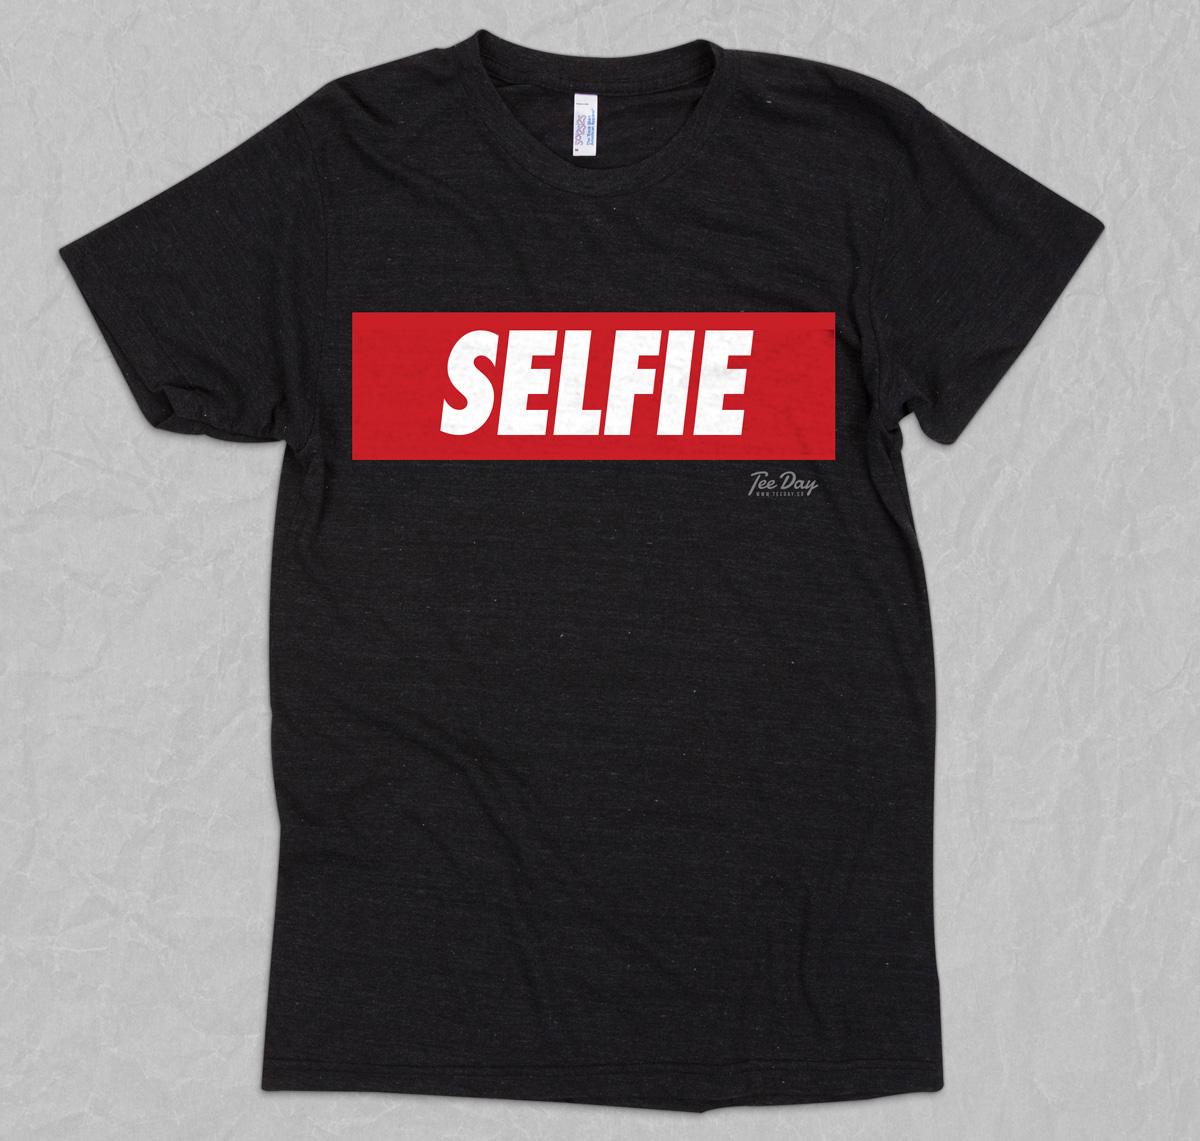 SELFIE - Sarcastic Funny T-shirts - Unique Pop Culture T-shirt ...